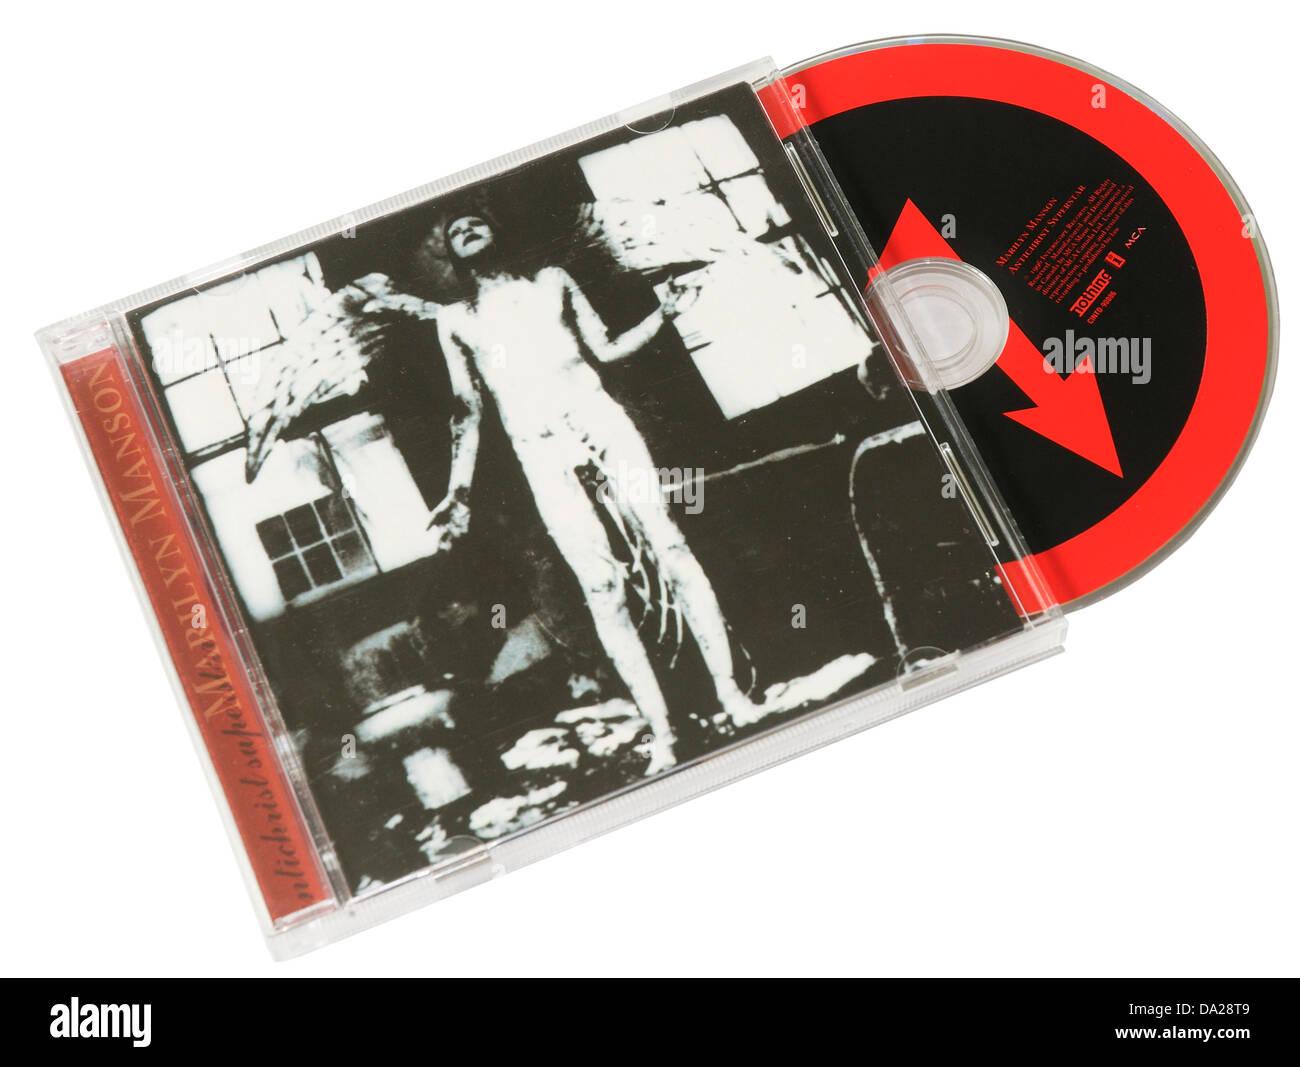 Marilyn Manson Antichrist Superstar album on CD - Stock Image